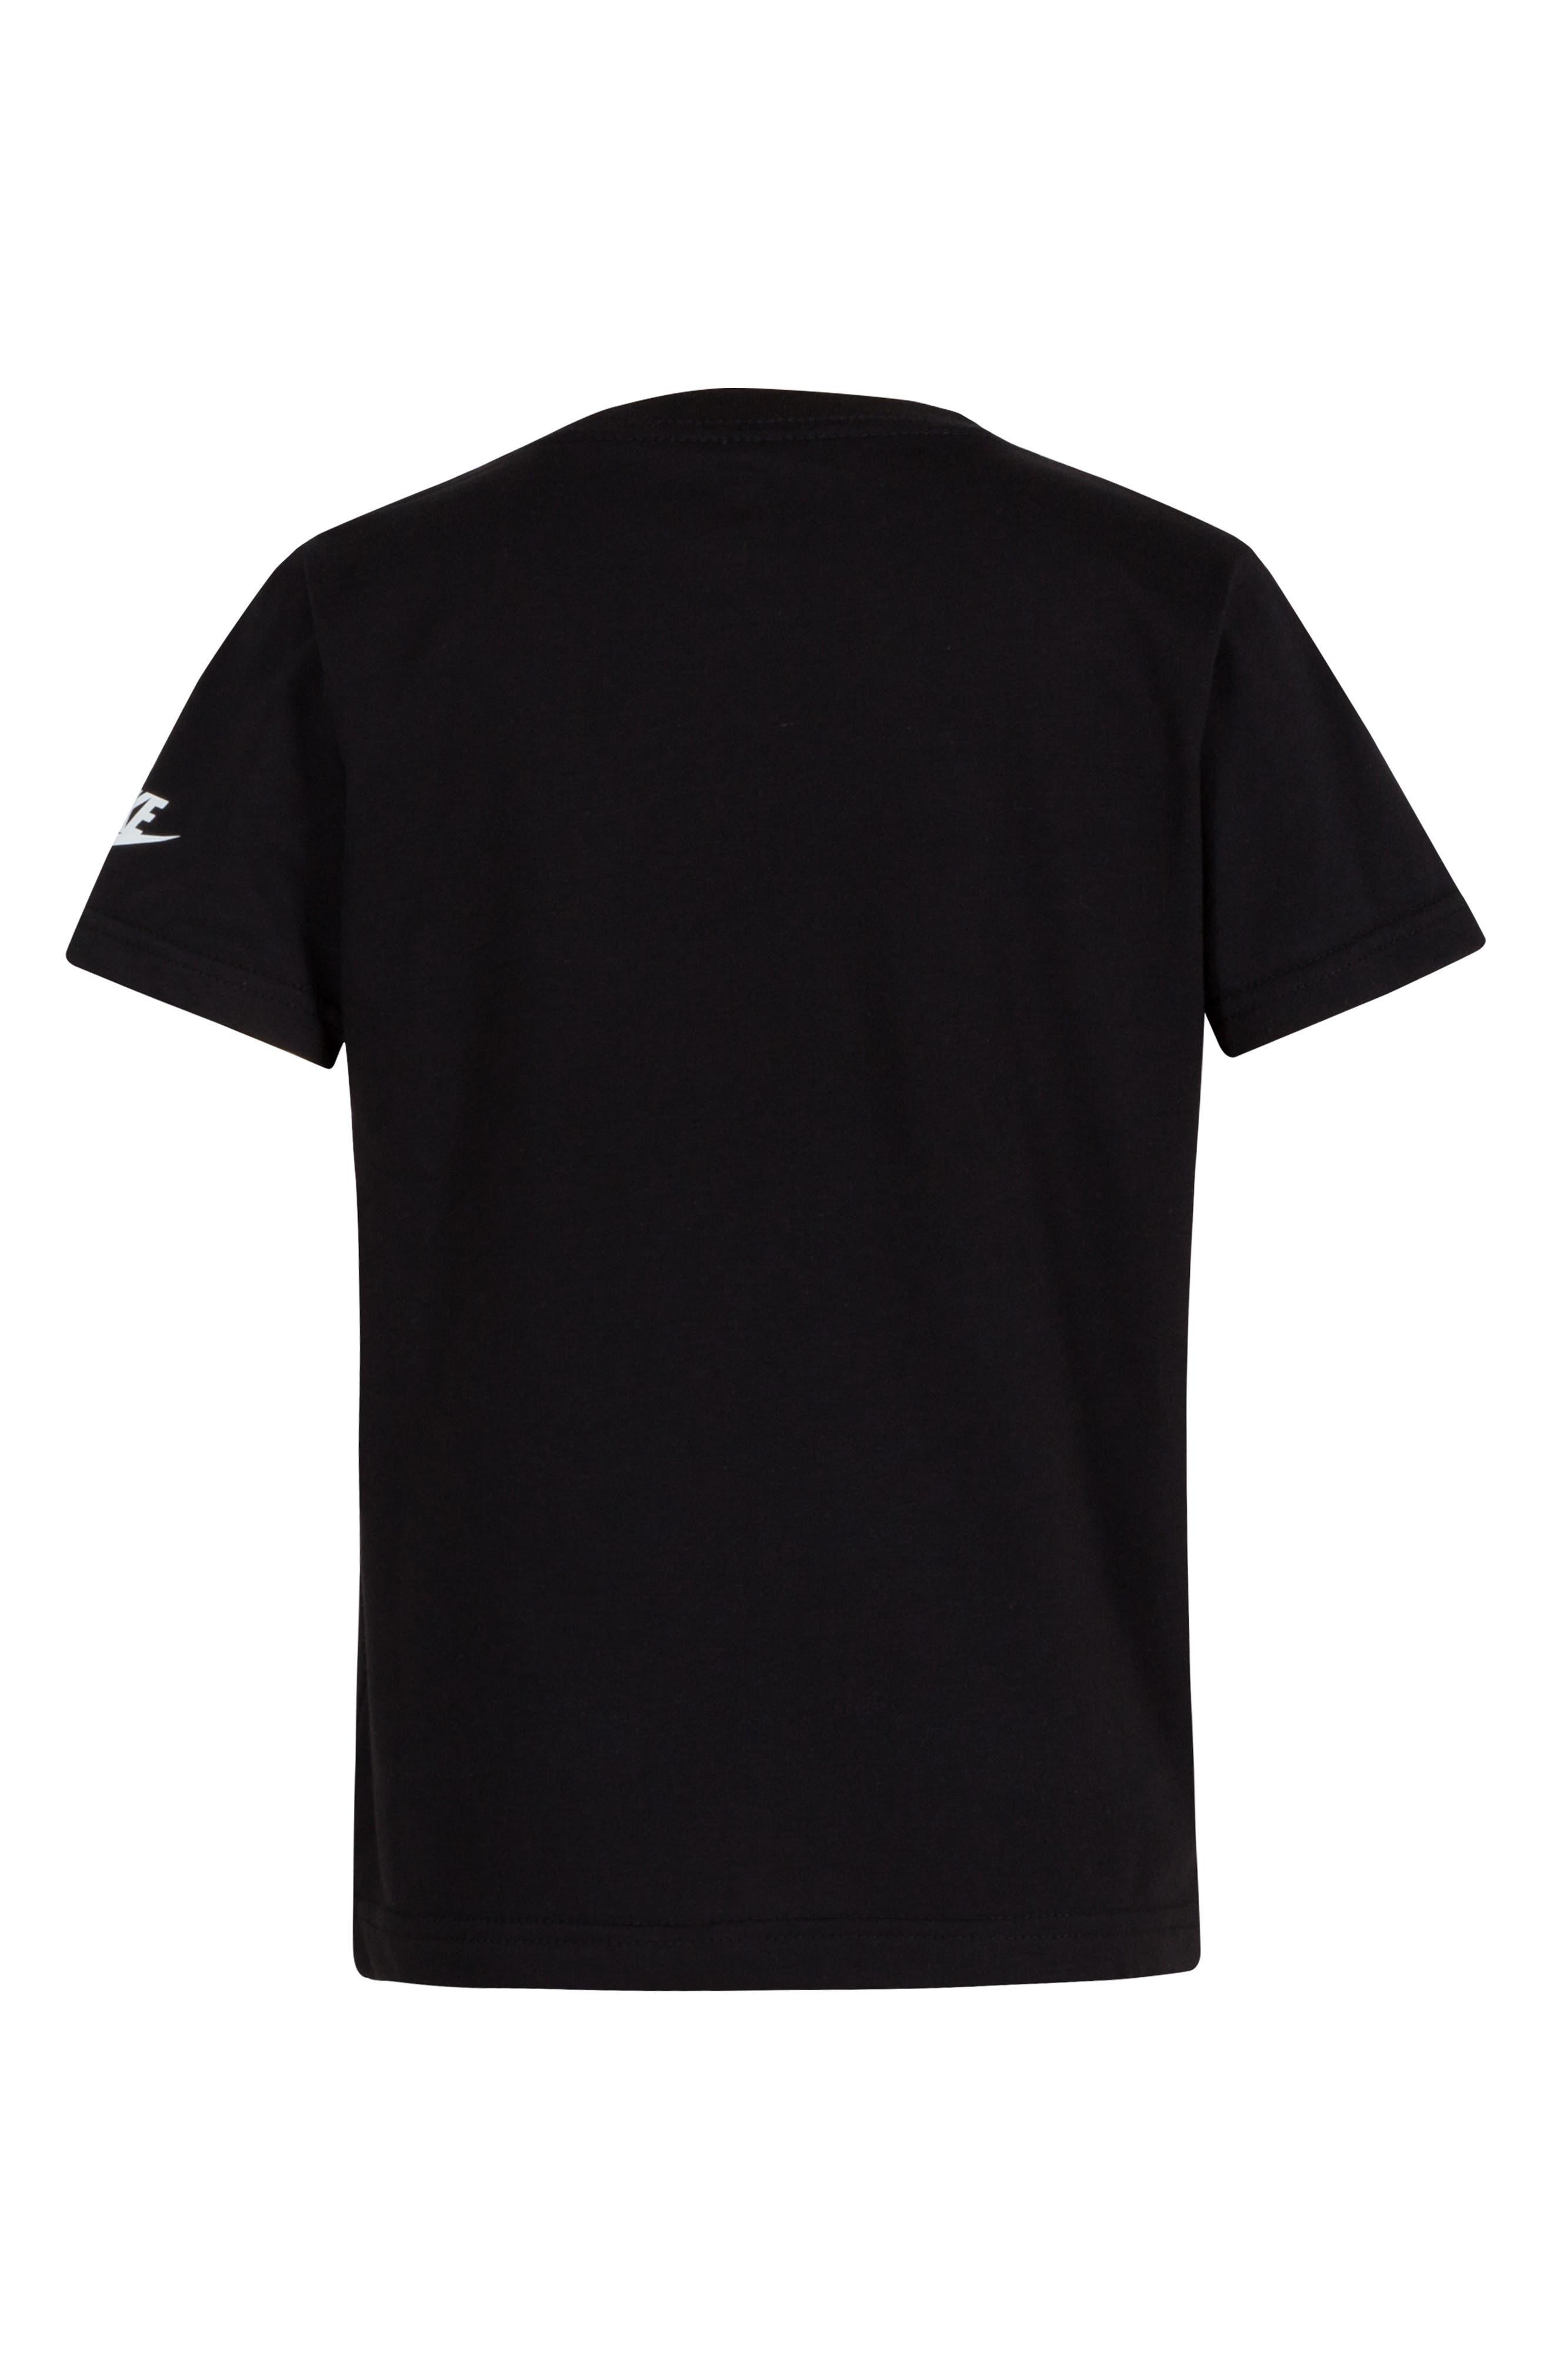 Dry Geo Multi Futura Graphic T-Shirt,                             Alternate thumbnail 2, color,                             BLACK